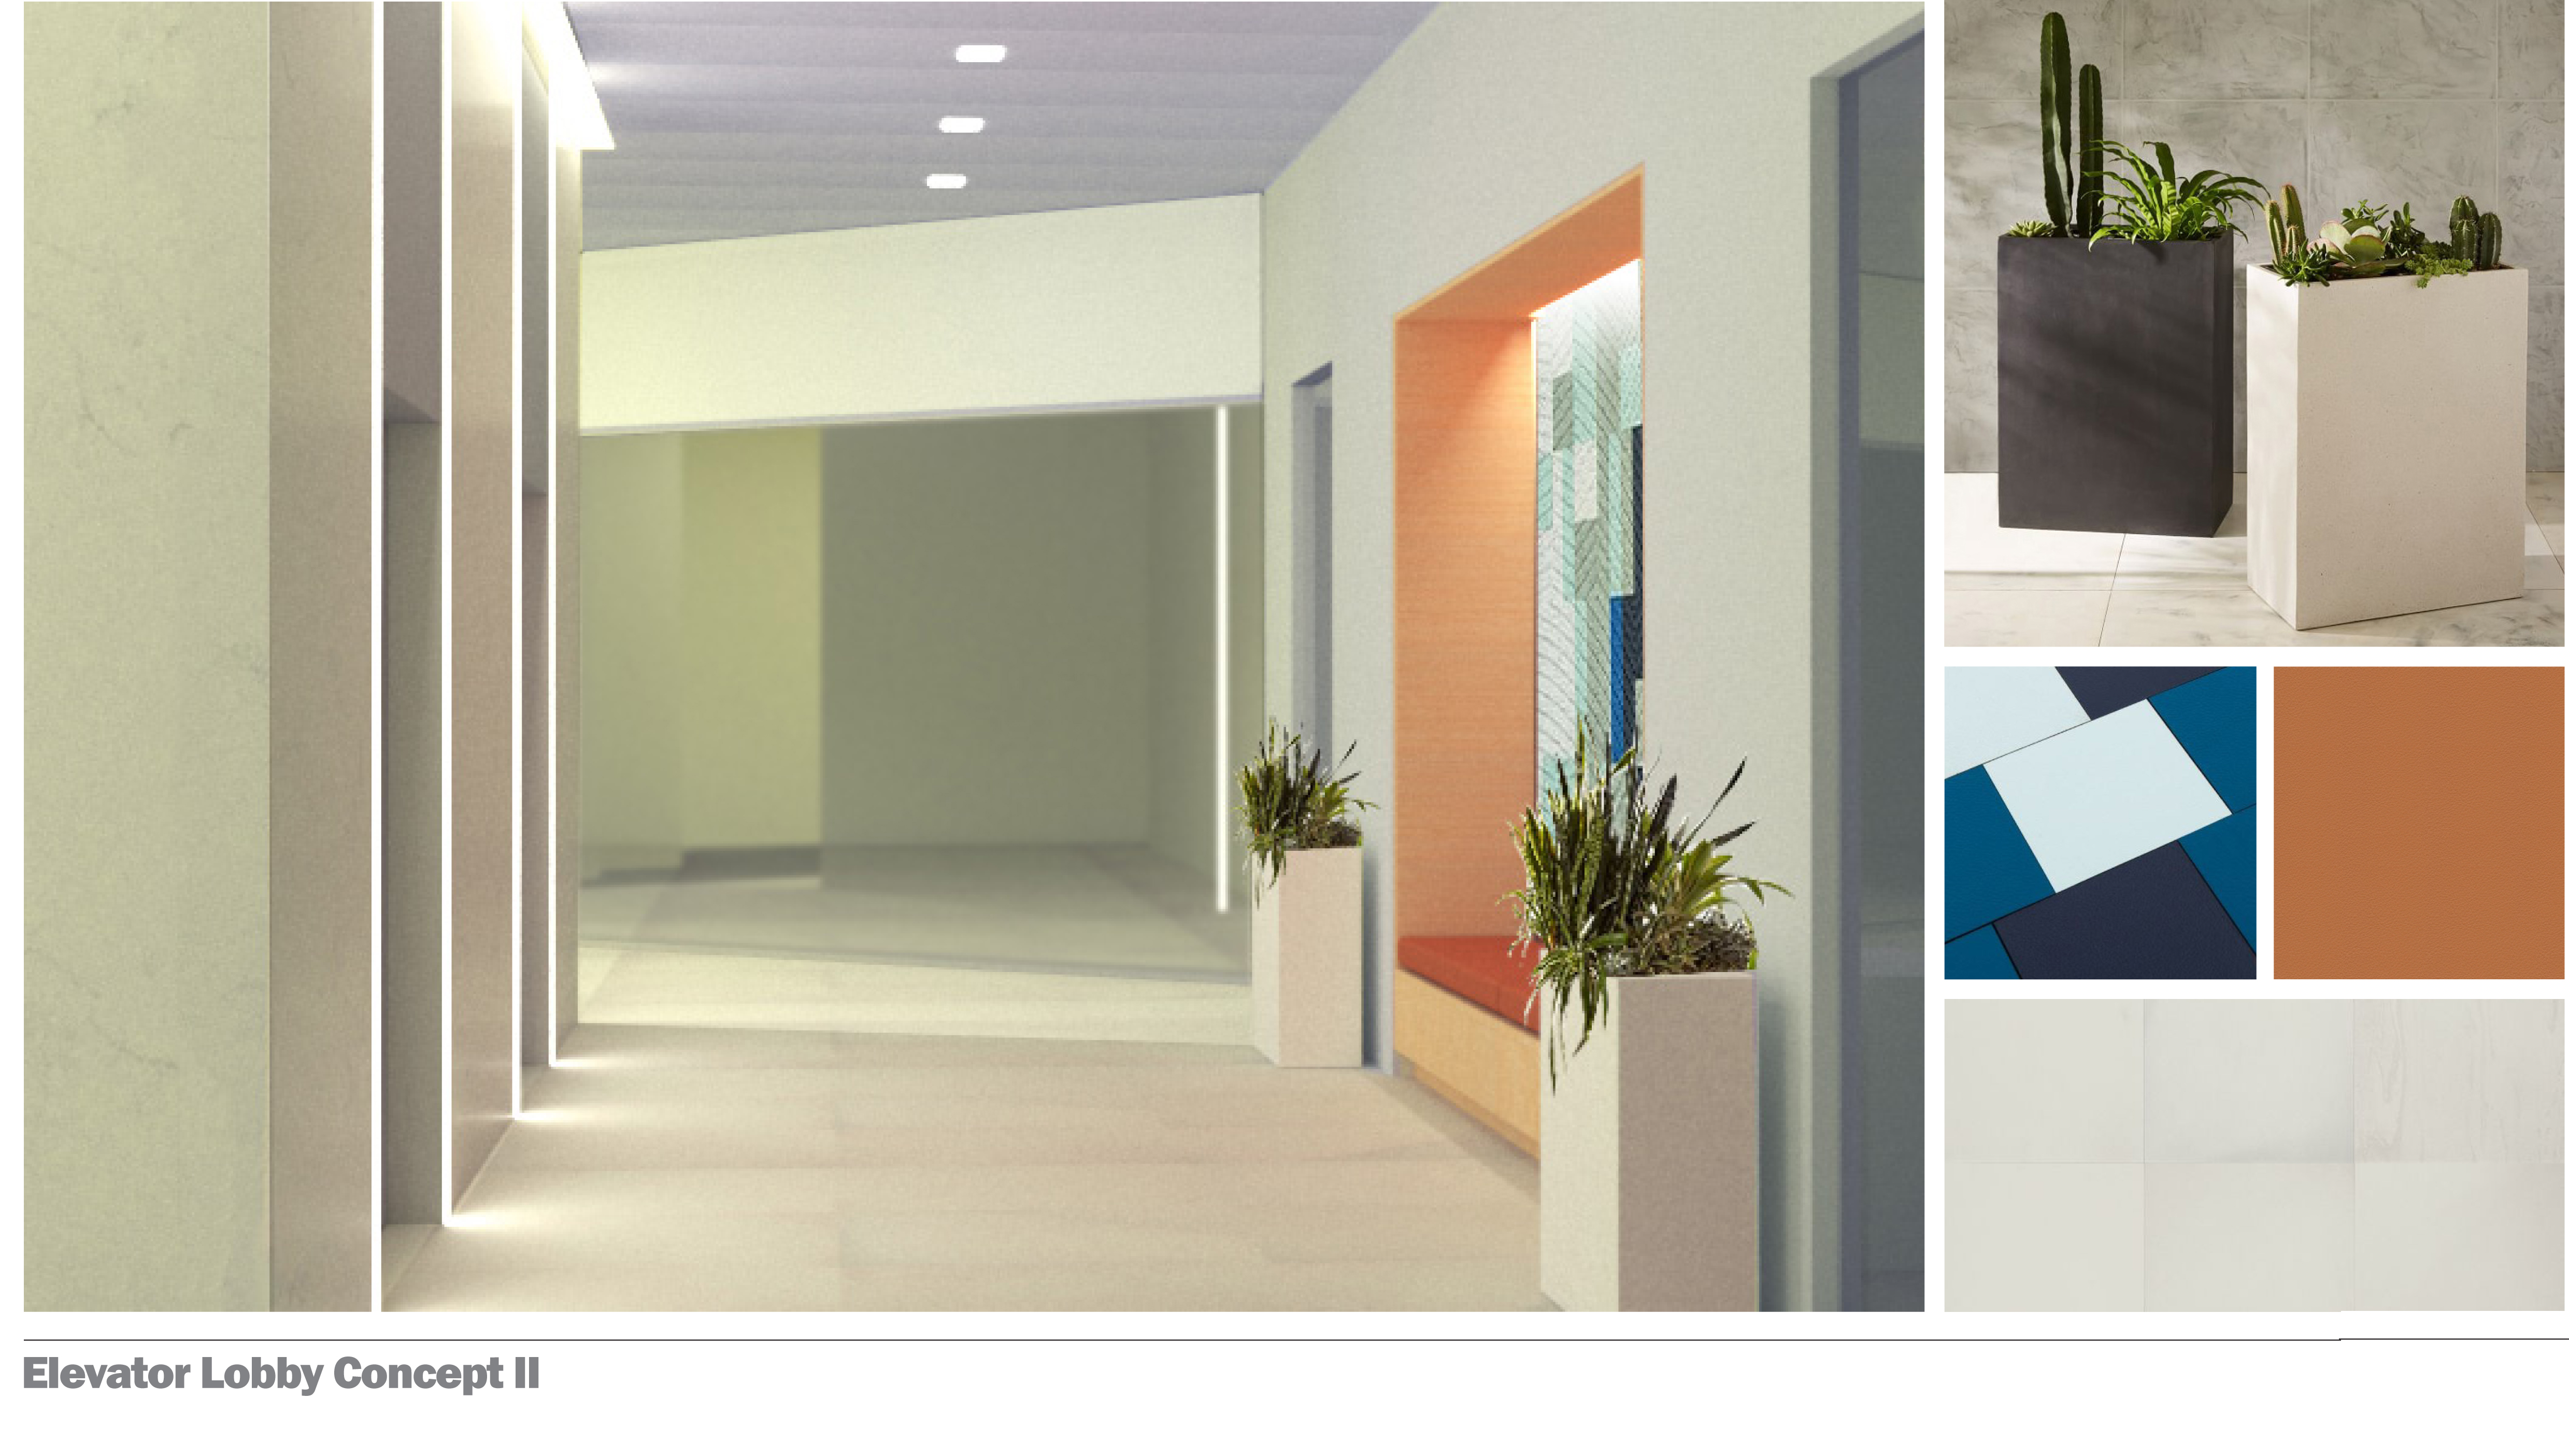 Elevator Lobby Concept II